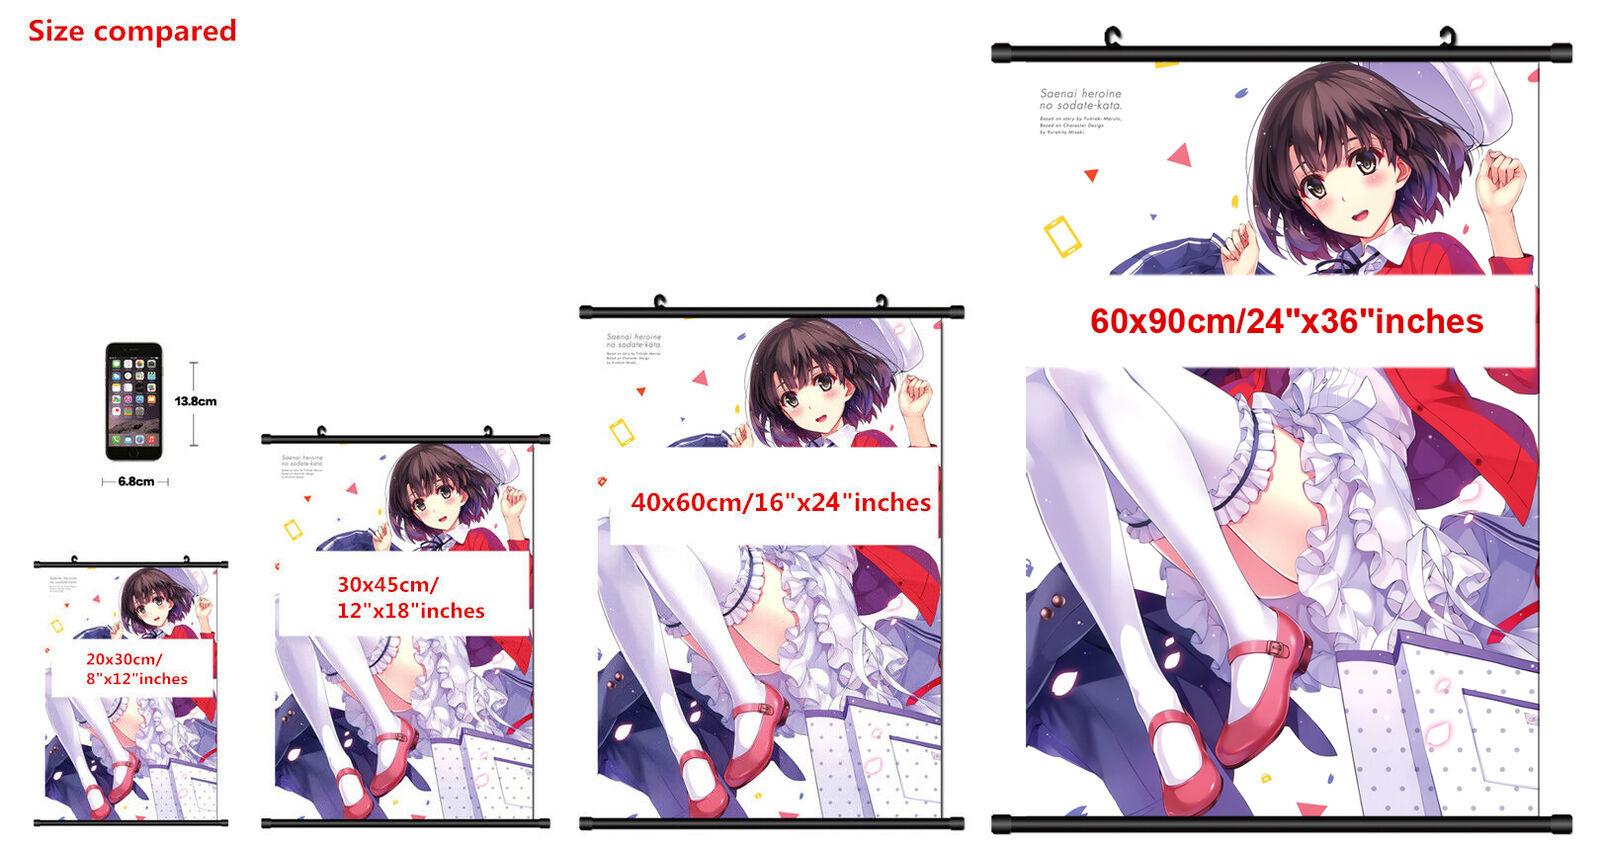 Demon Slayer Kimetsu No Yaiba Anime Wallscroll Poster Kunstdrucke Bider Drucke